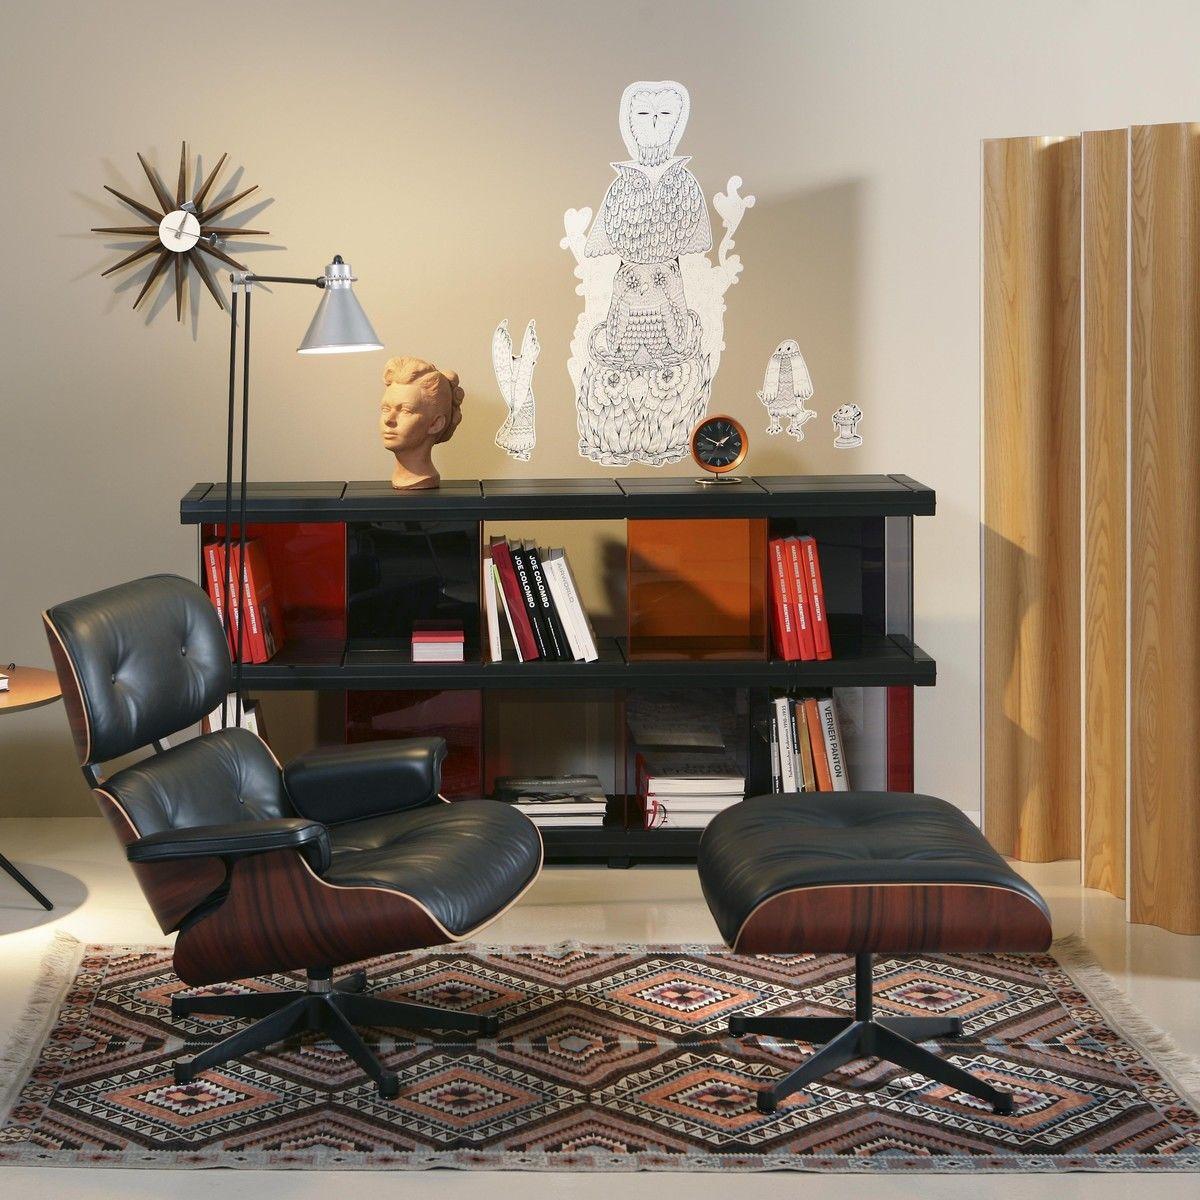 vitra eames lounge chair ottoman - Eames Lounge Stuhl Abmessungen